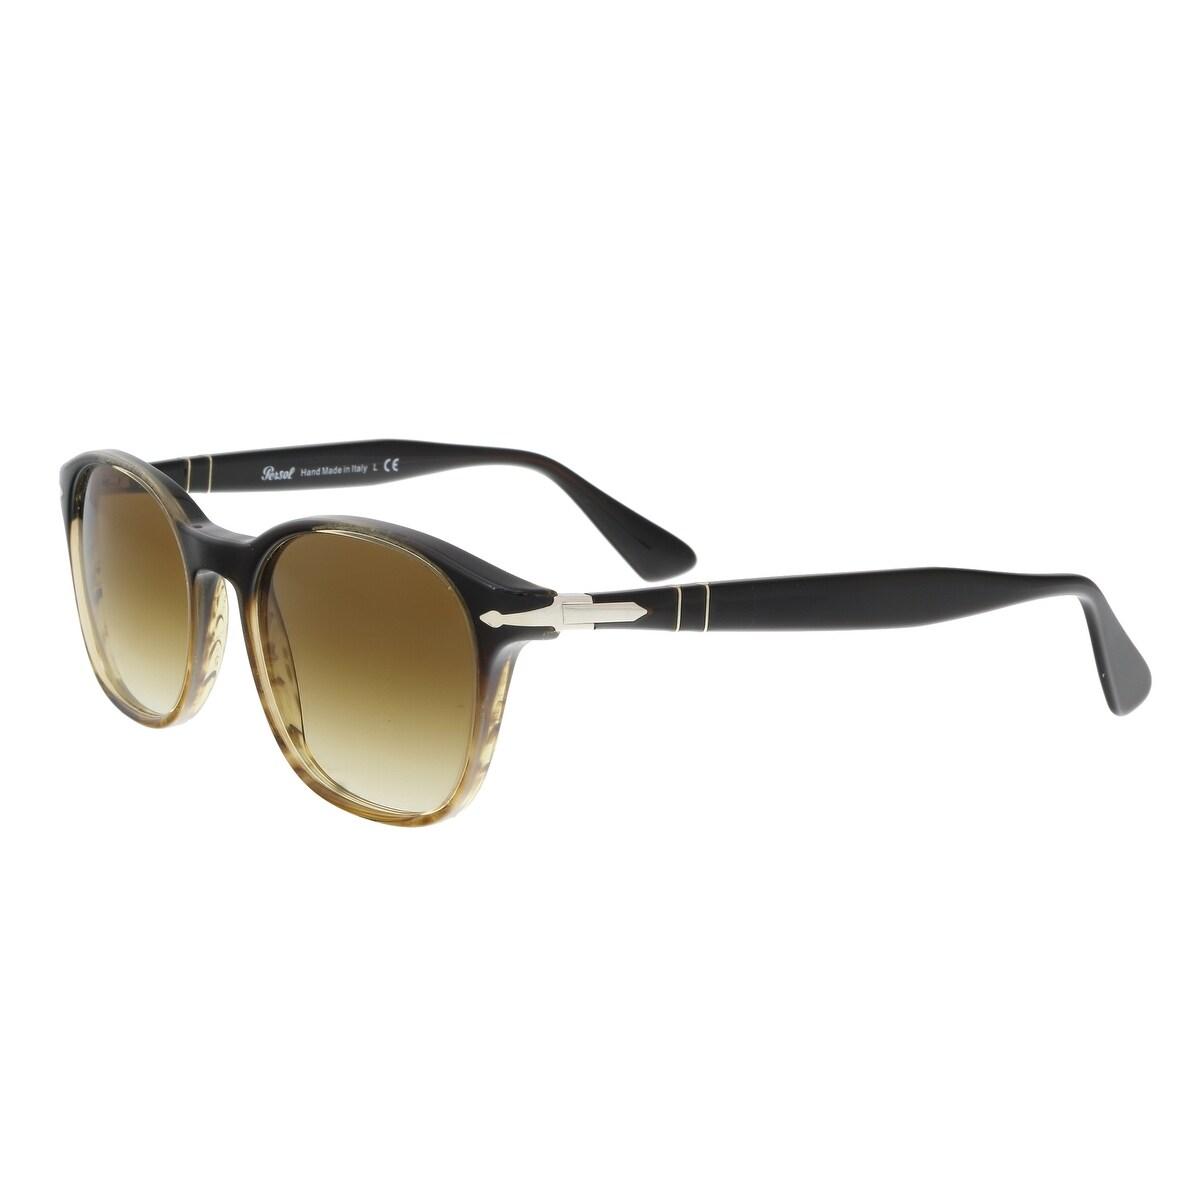 01244b48dcf Persol Sunglasses